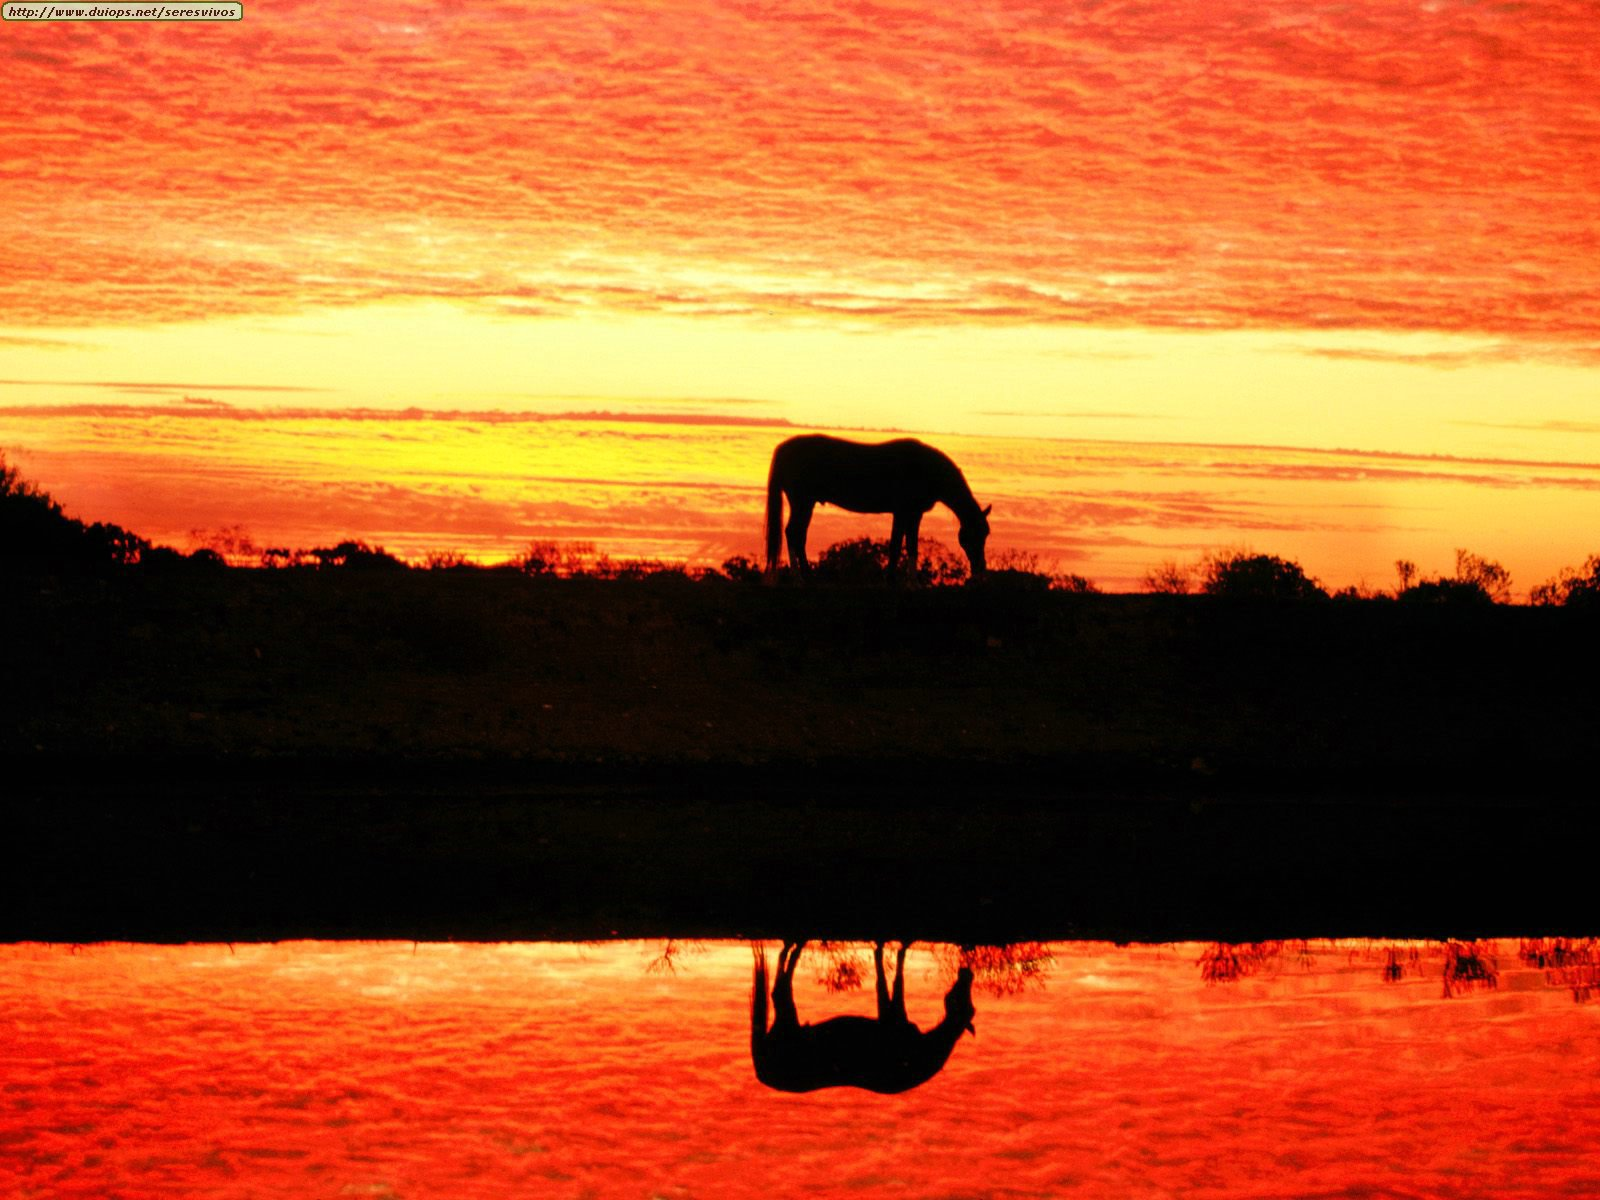 http://www.duiops.net/seresvivos/galeria/caballos/Animals%20Horses_Arabian%20Reflection.jpg